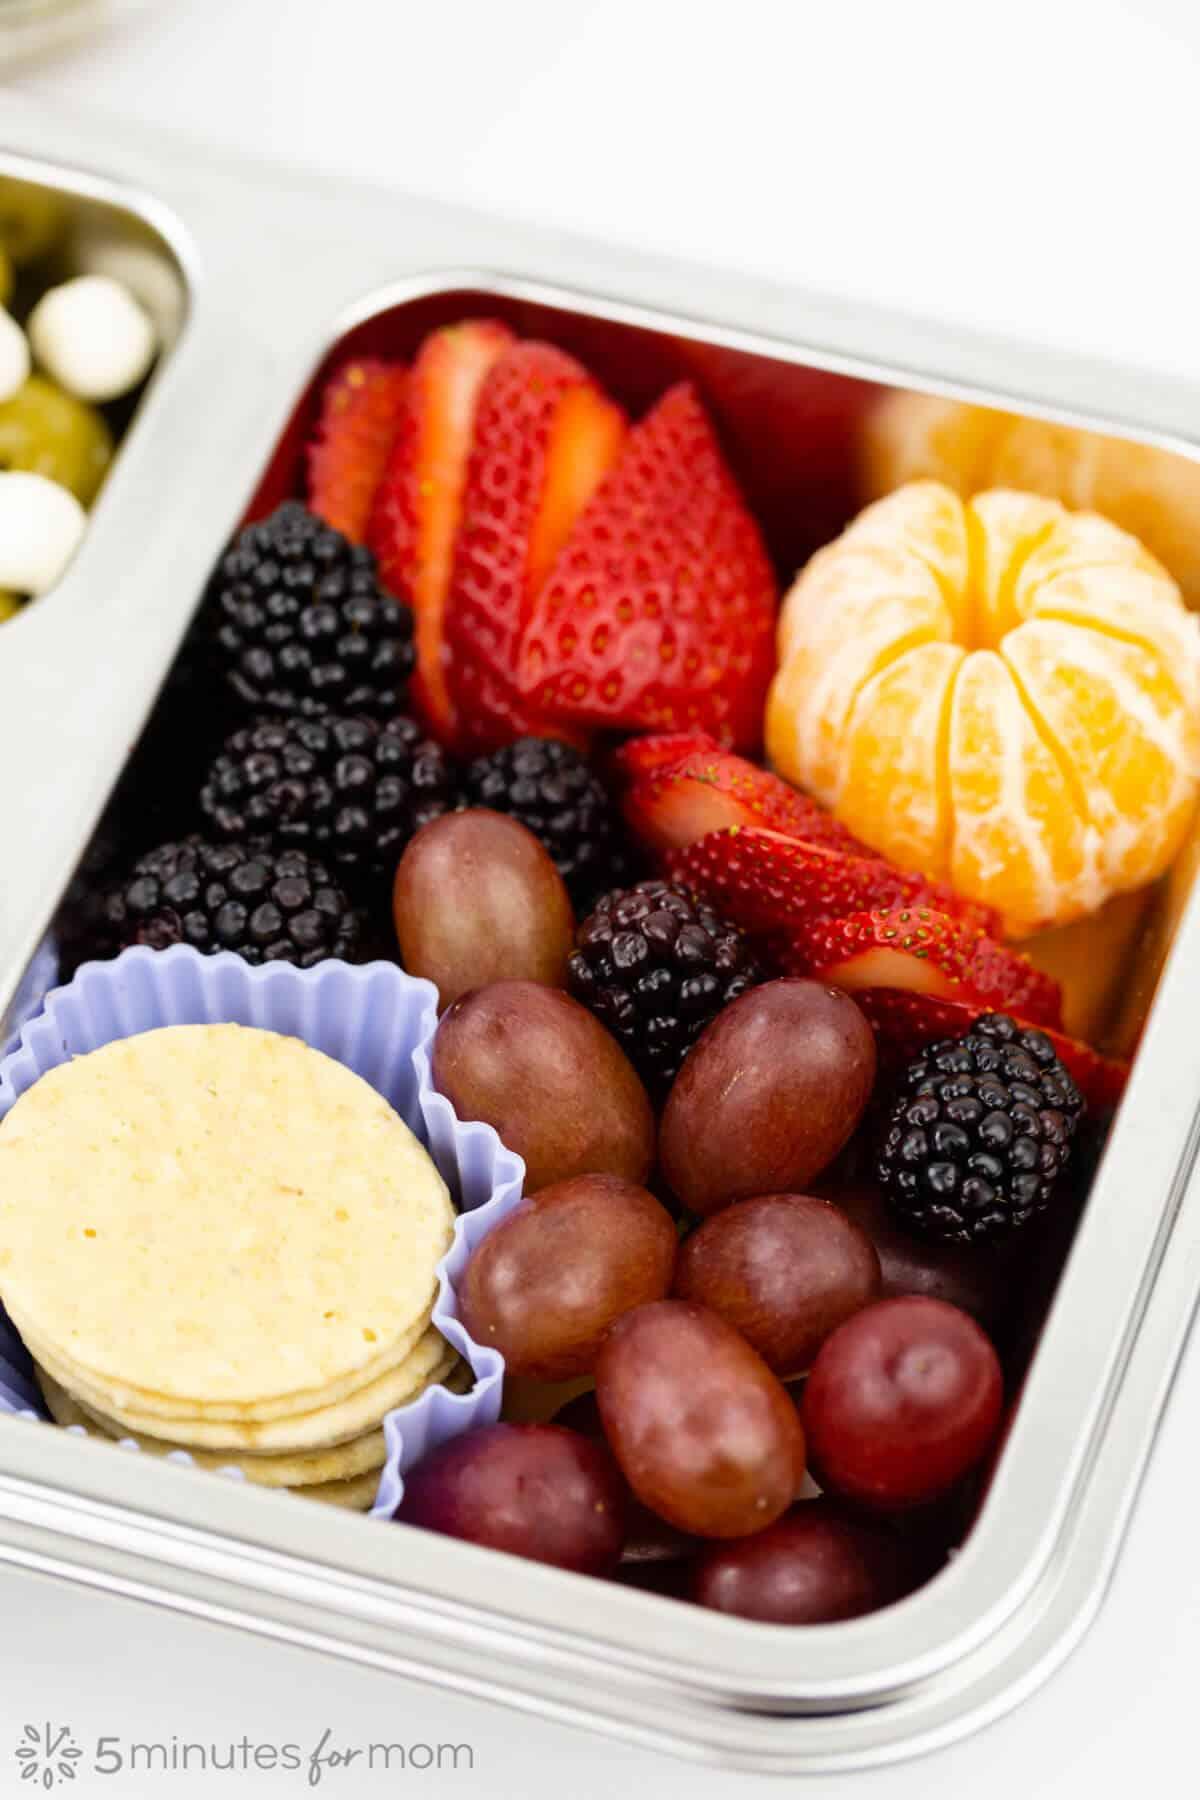 bento box with fresh fruit